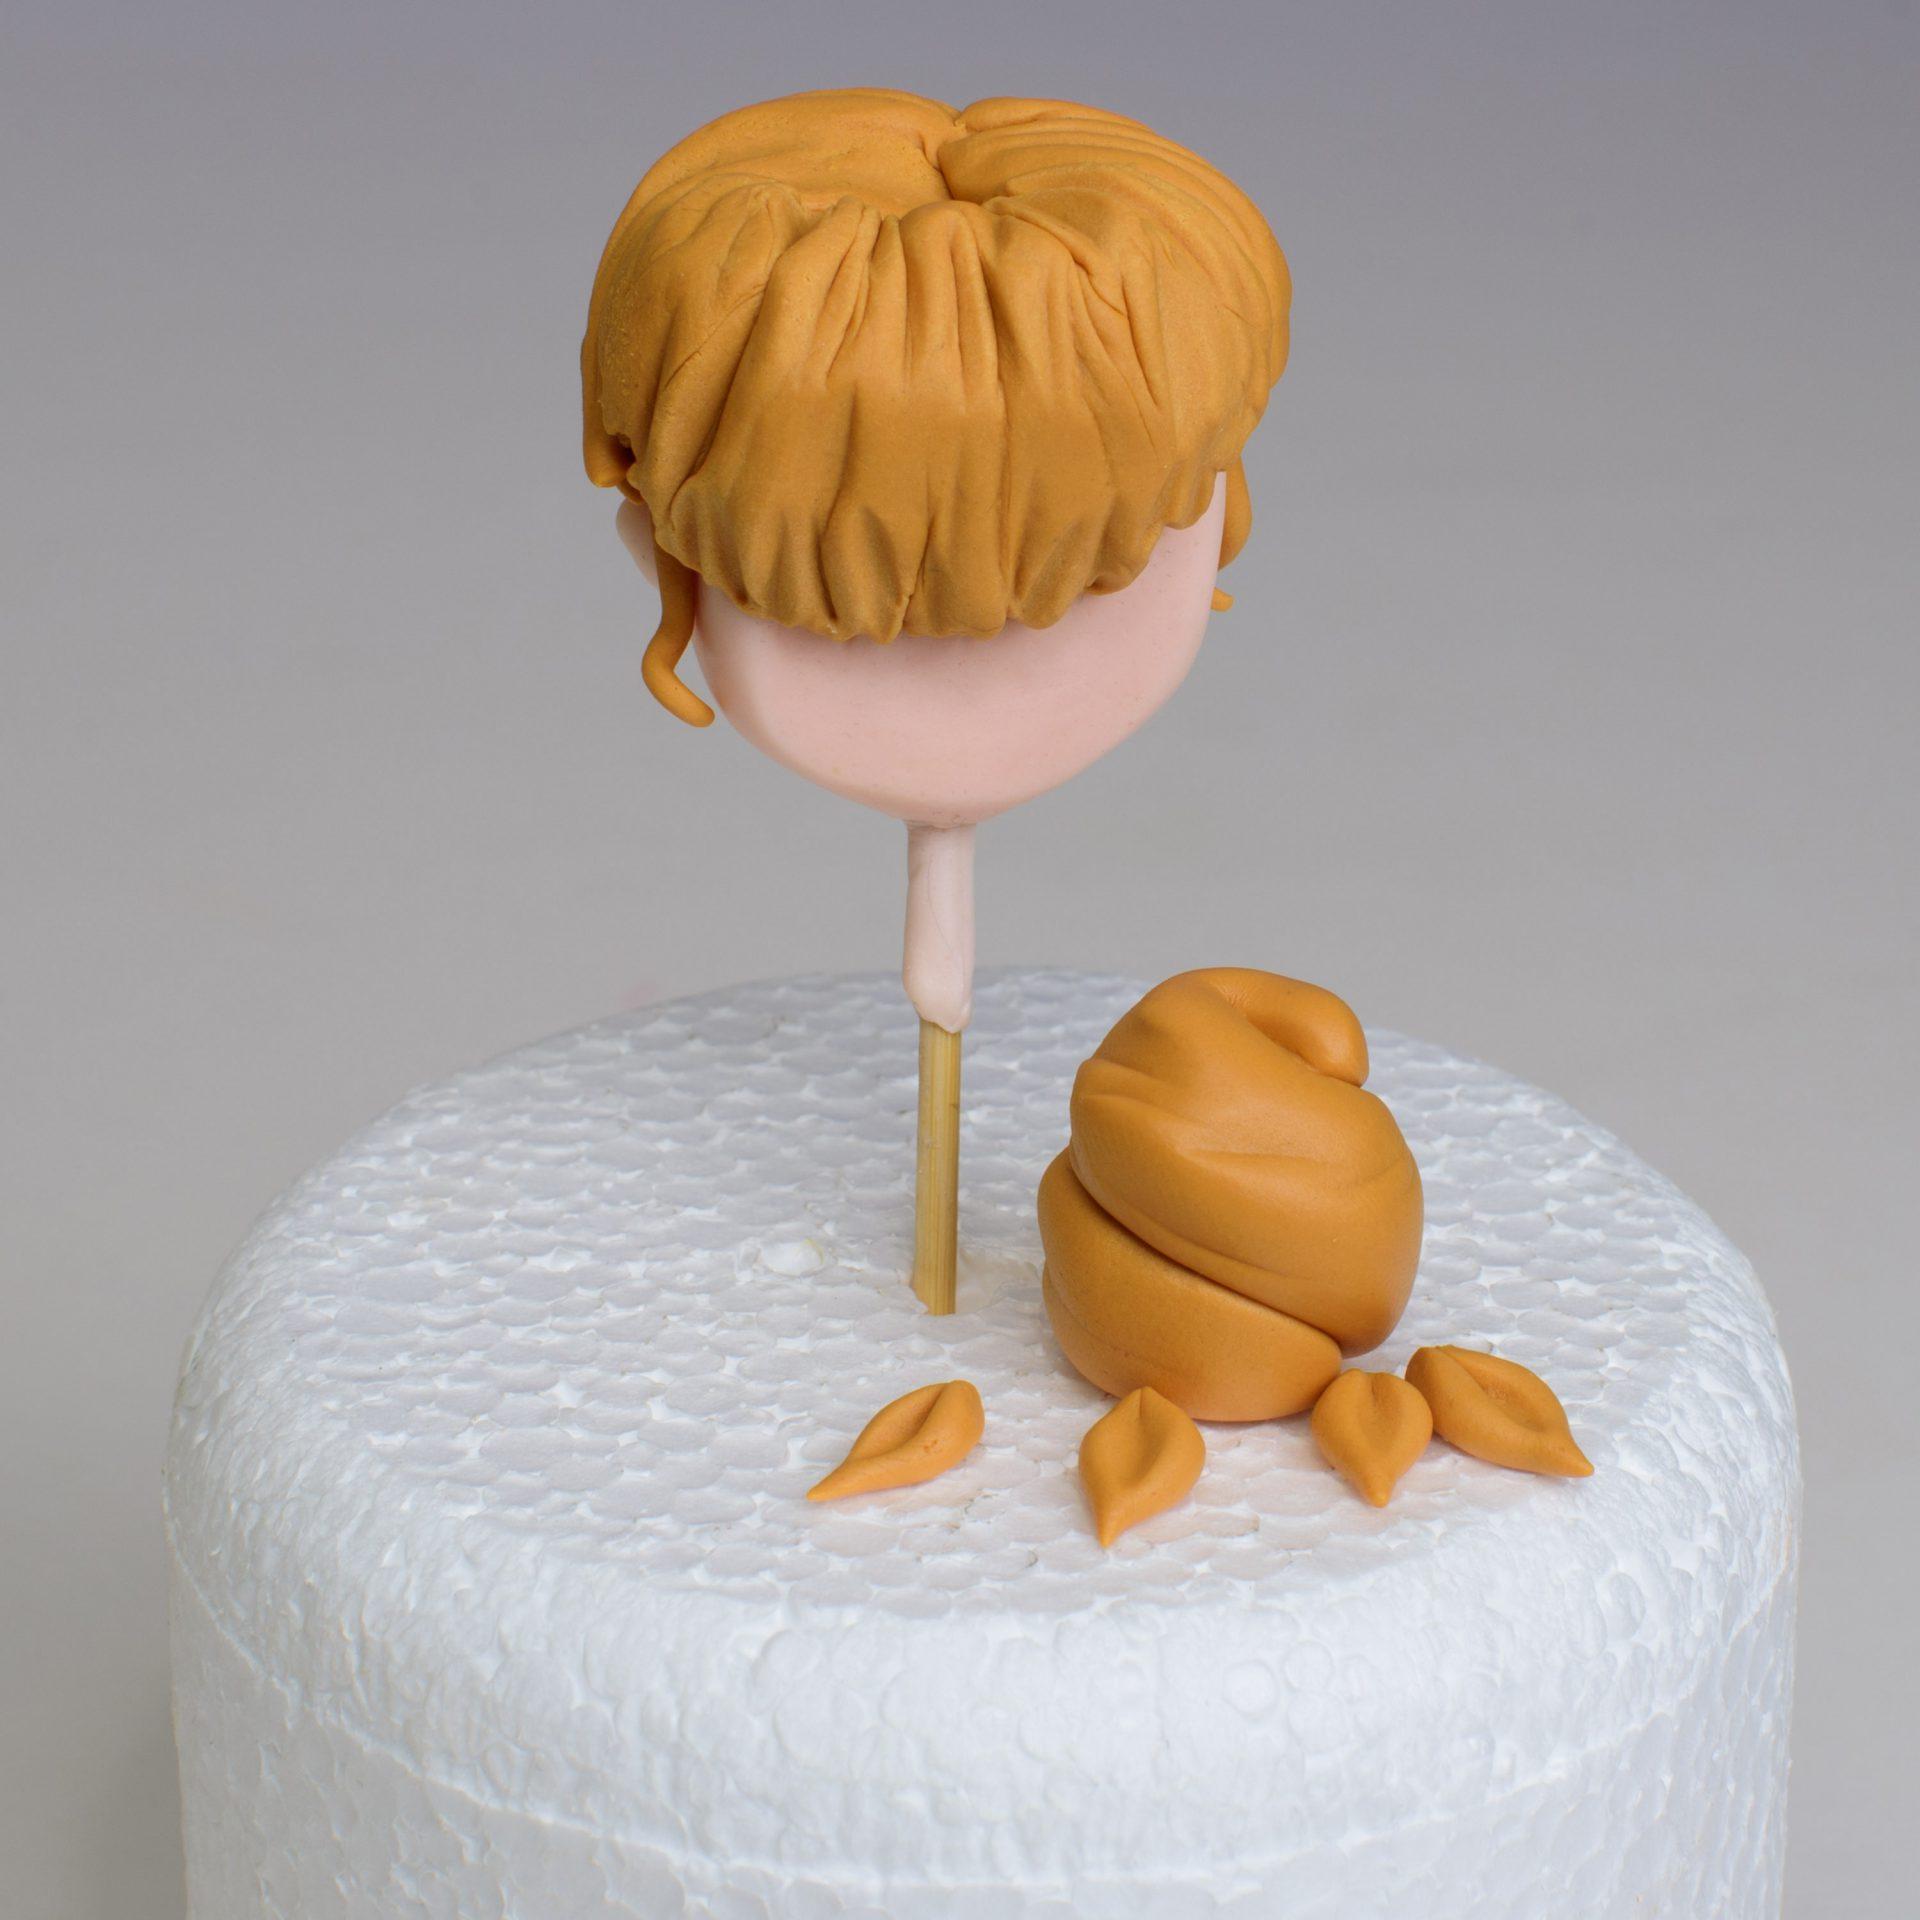 Vintage Figurine - Gareth Davies, LetThemSeeCake